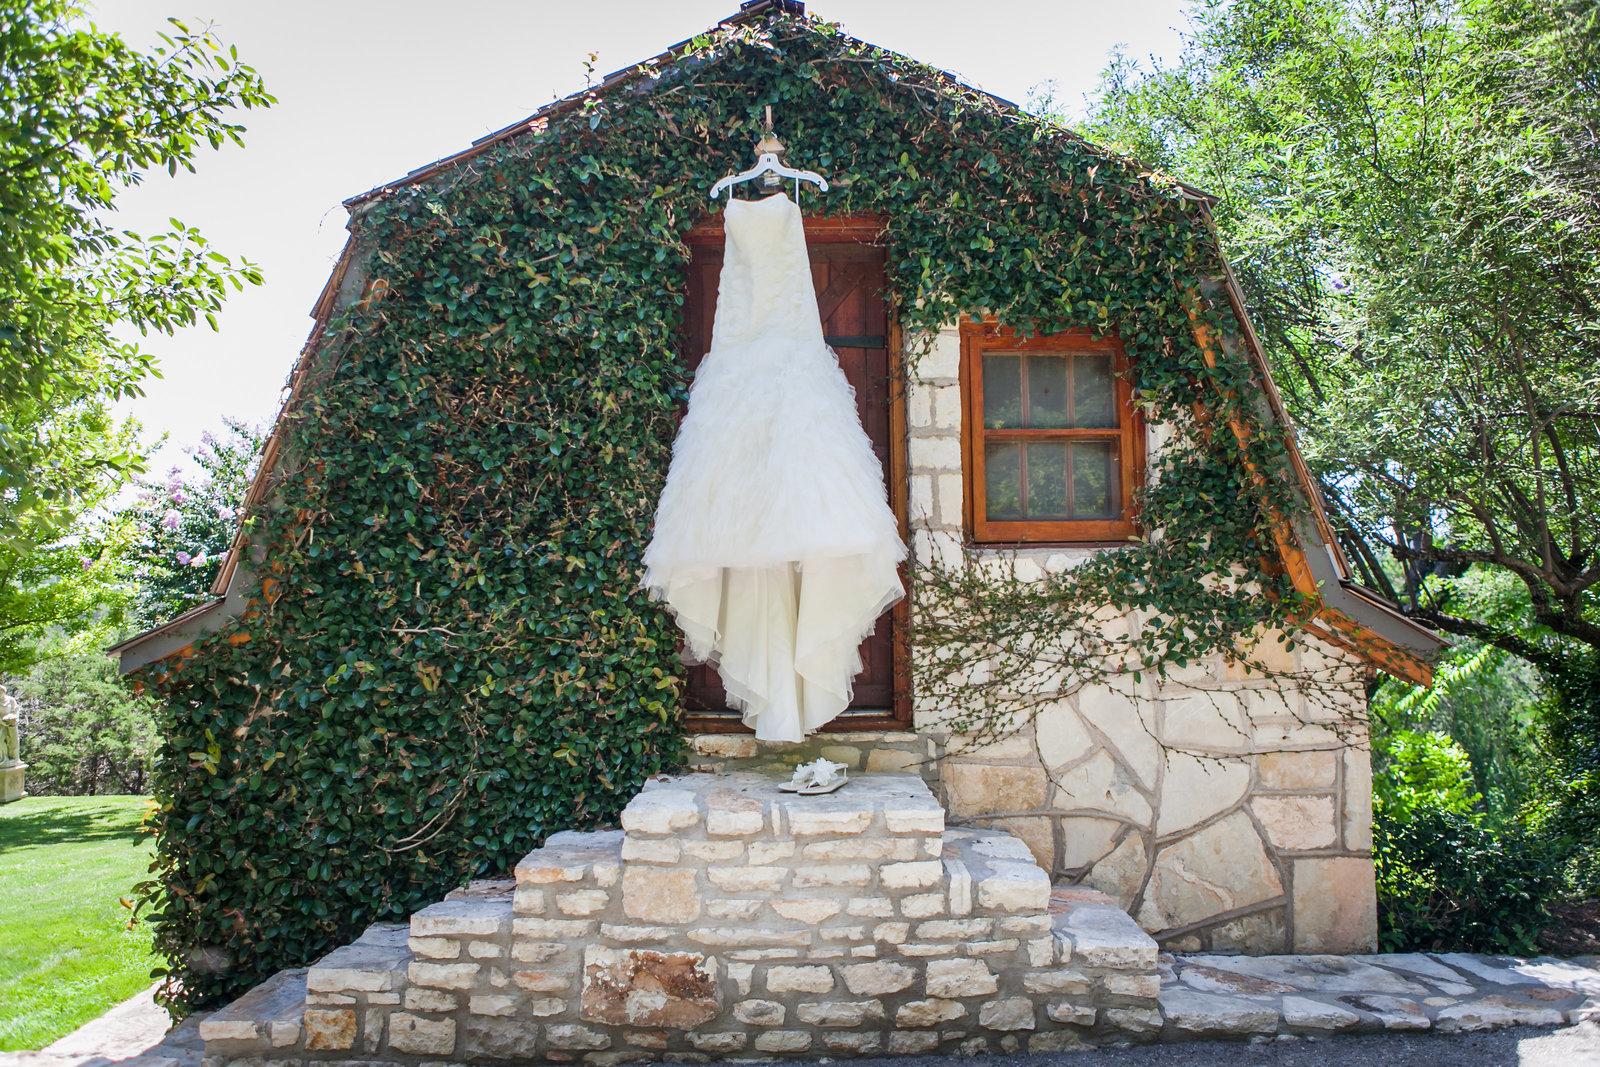 Austin Family Photographer, Tiffany Chapman, bride's dress hanging on barn  photo